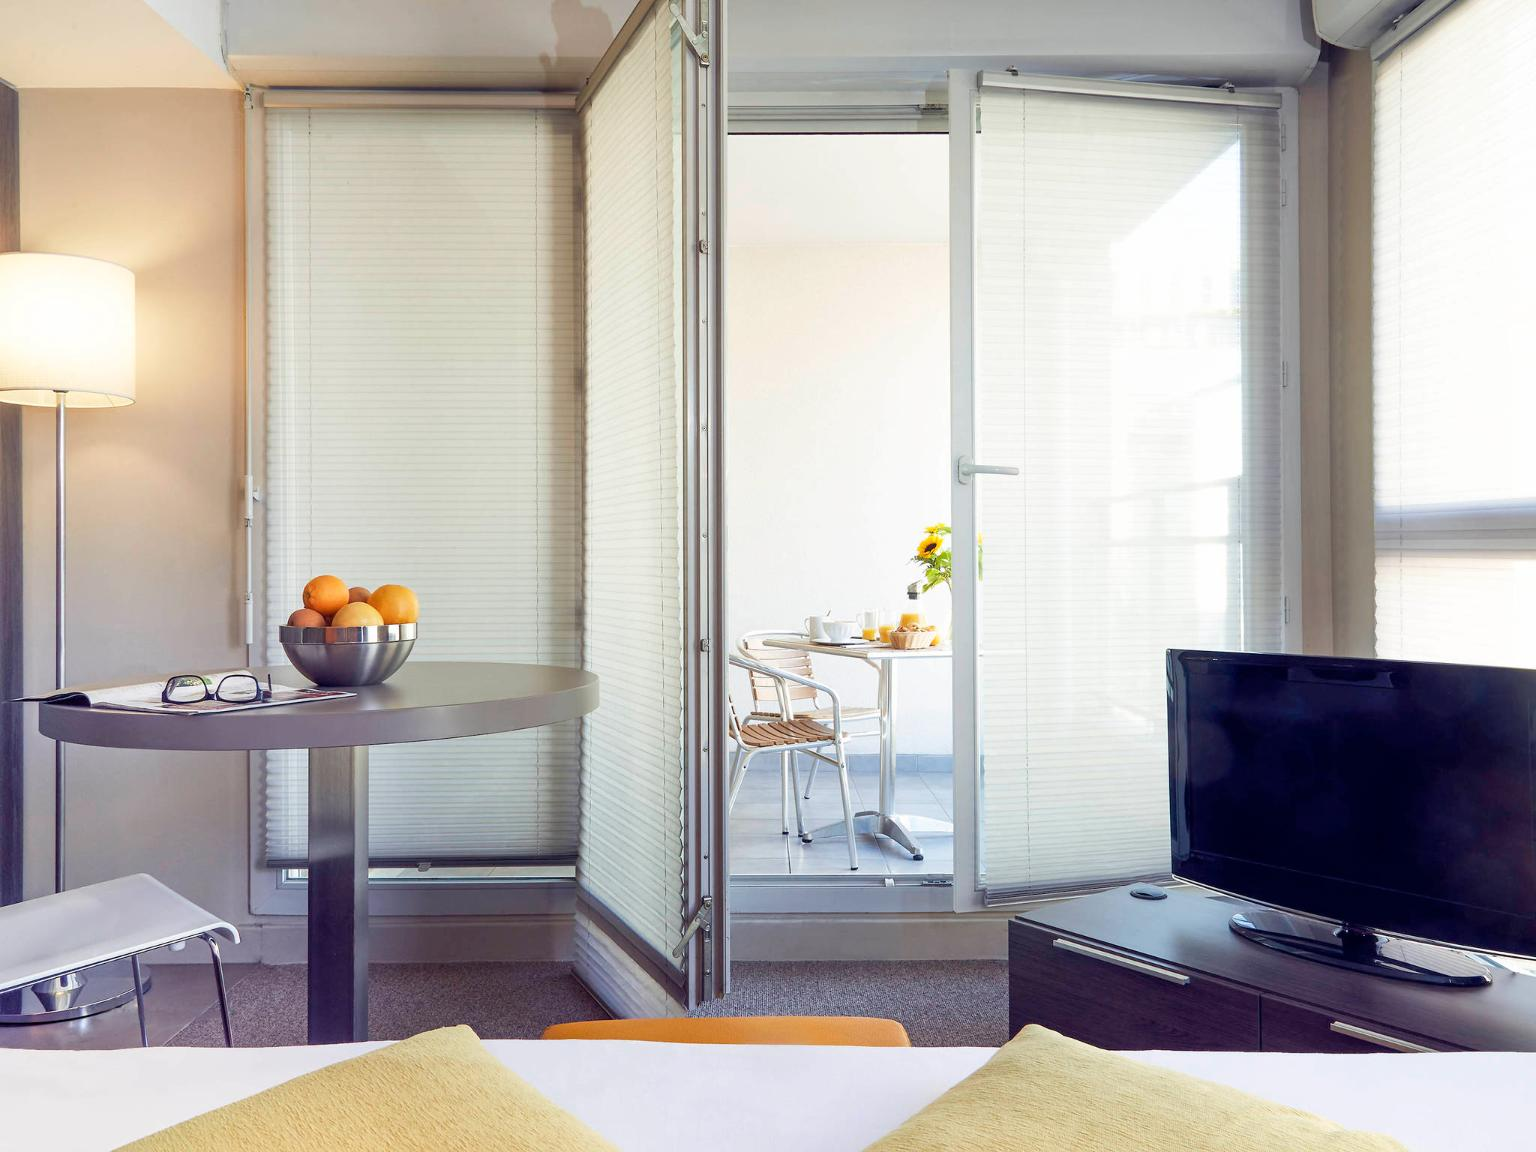 aparthotel adagio marseille vieux port h 244 tel 30 rue jean trinquet 13001 marseille adresse